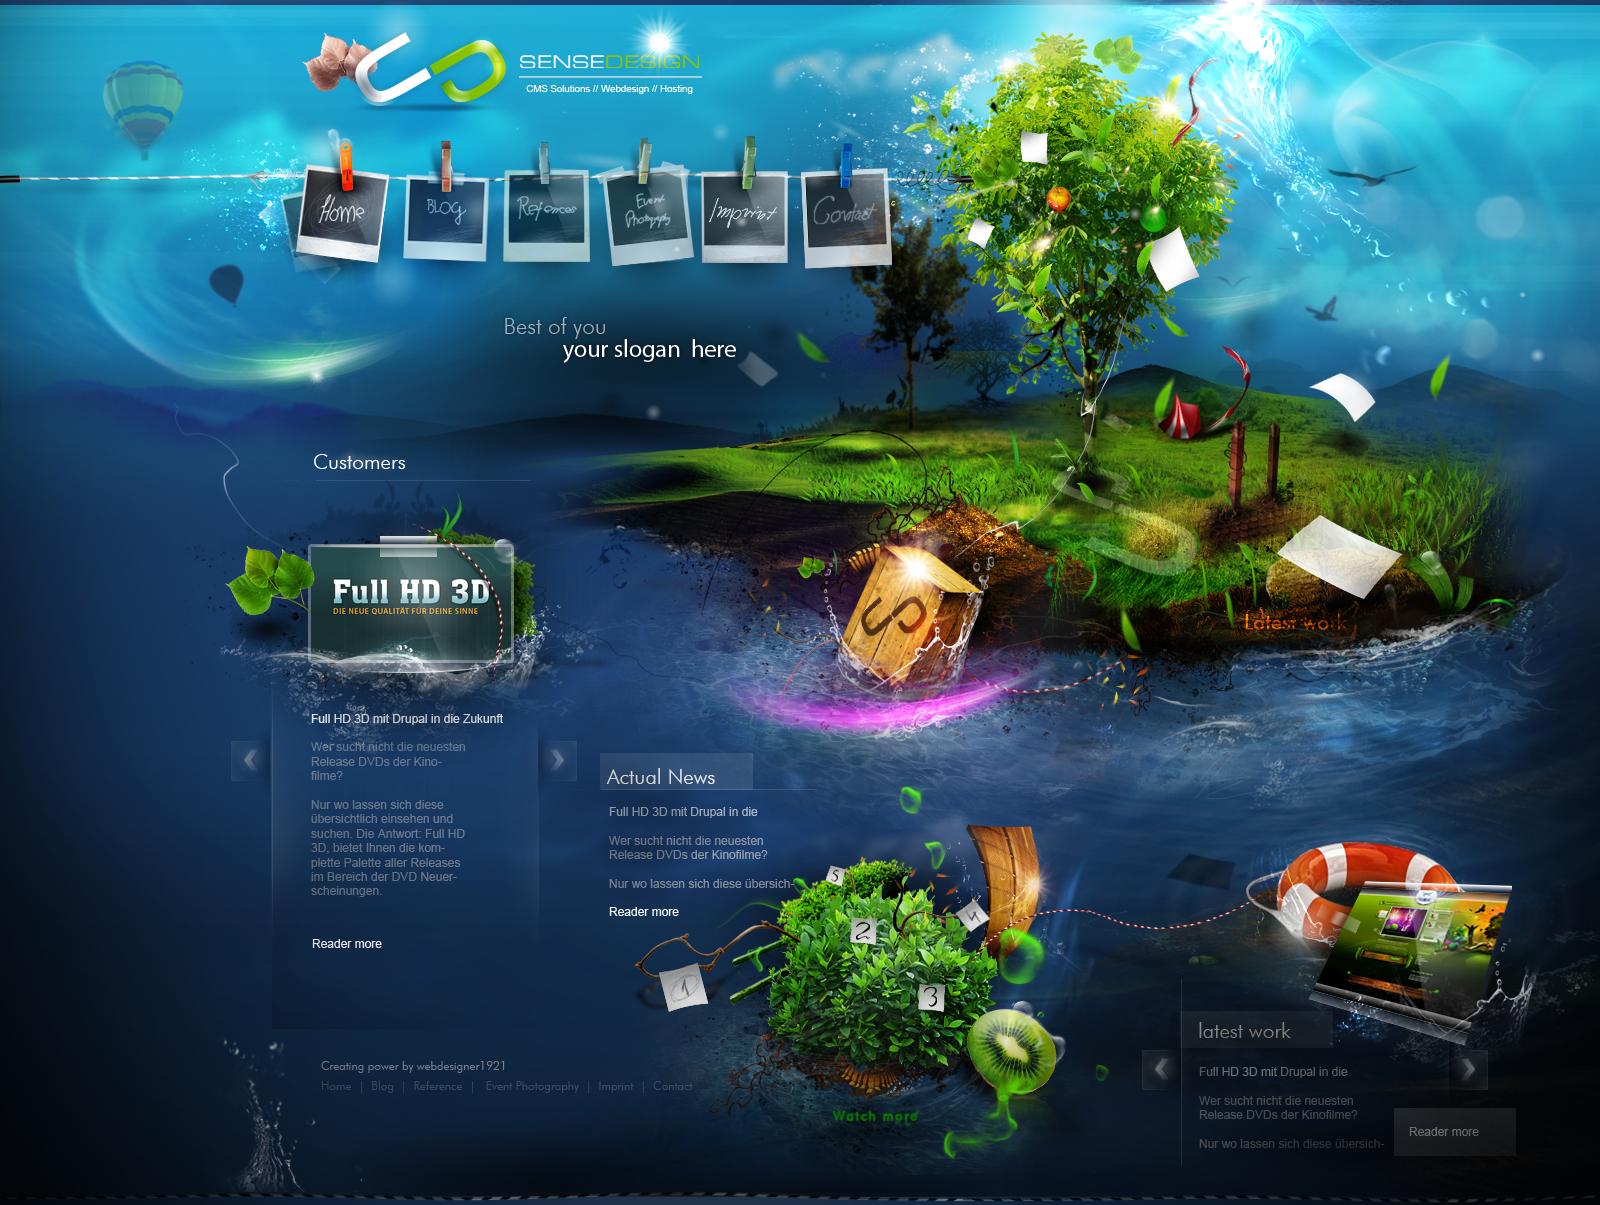 http://orig09.deviantart.net/e1bf/f/2010/058/c/9/sense_design_ver_1_by_webdesigner1921.png